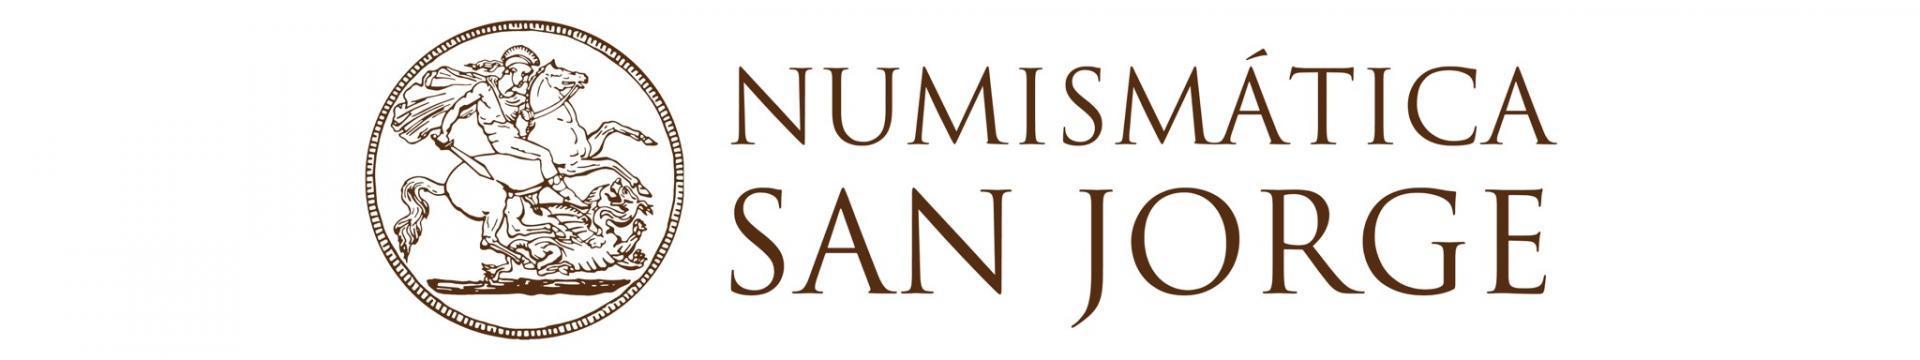 Numismática San Jorge